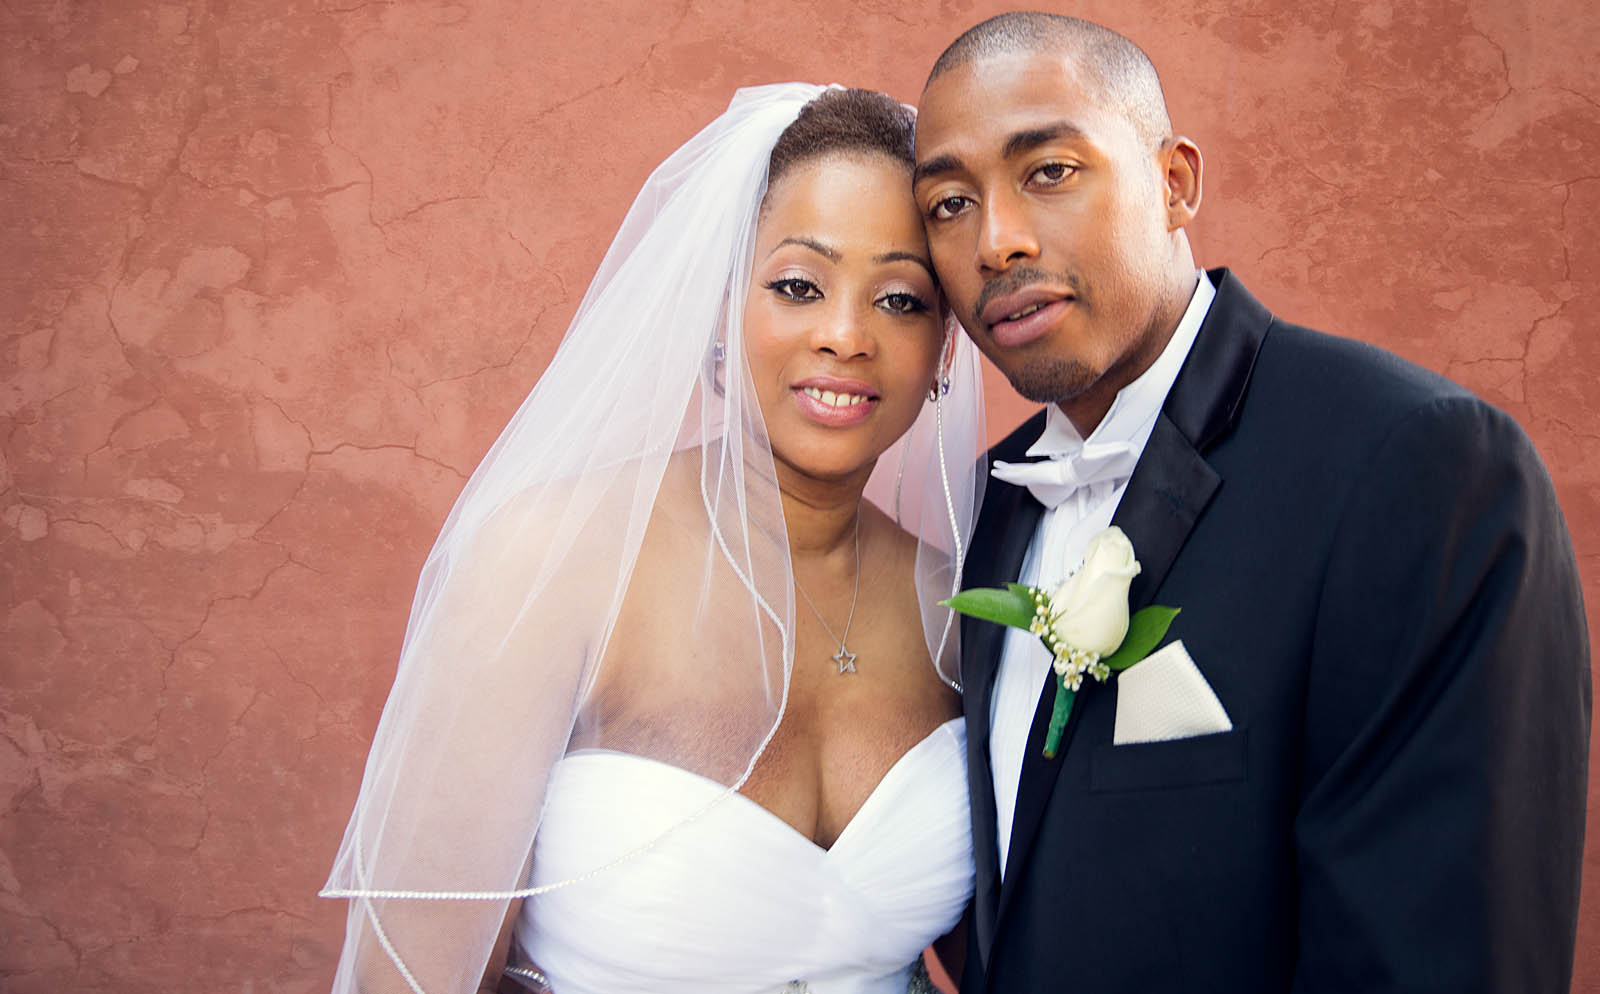 Malik_and_Shanika_Wedding_Ernestosue-9108-Edit.jpg